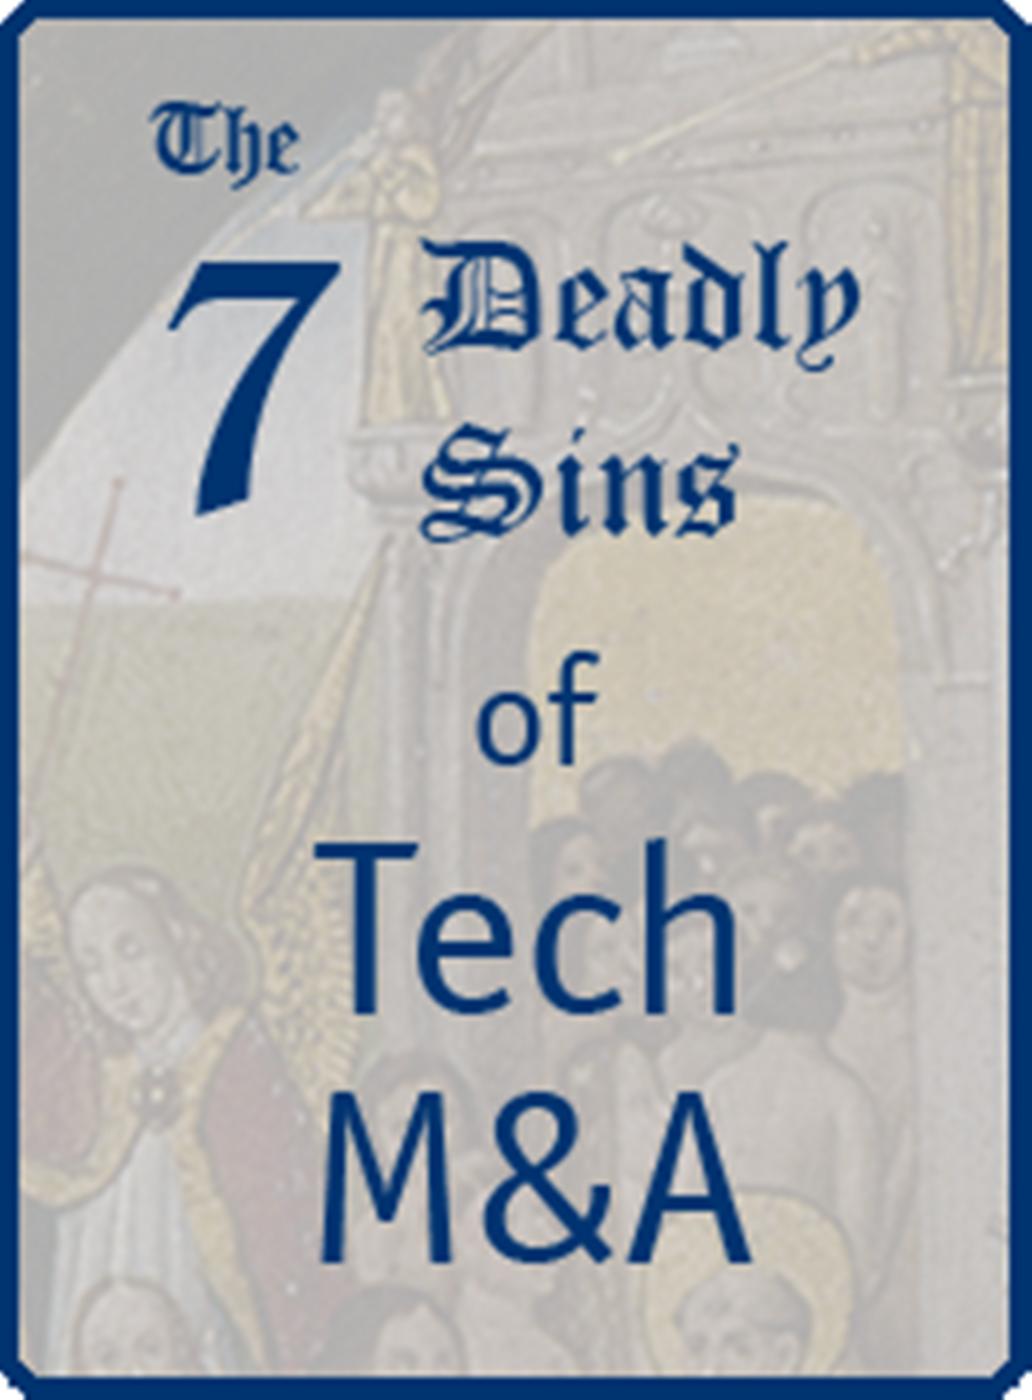 7 Deadly Sins of Tech M&A: #2 & 3